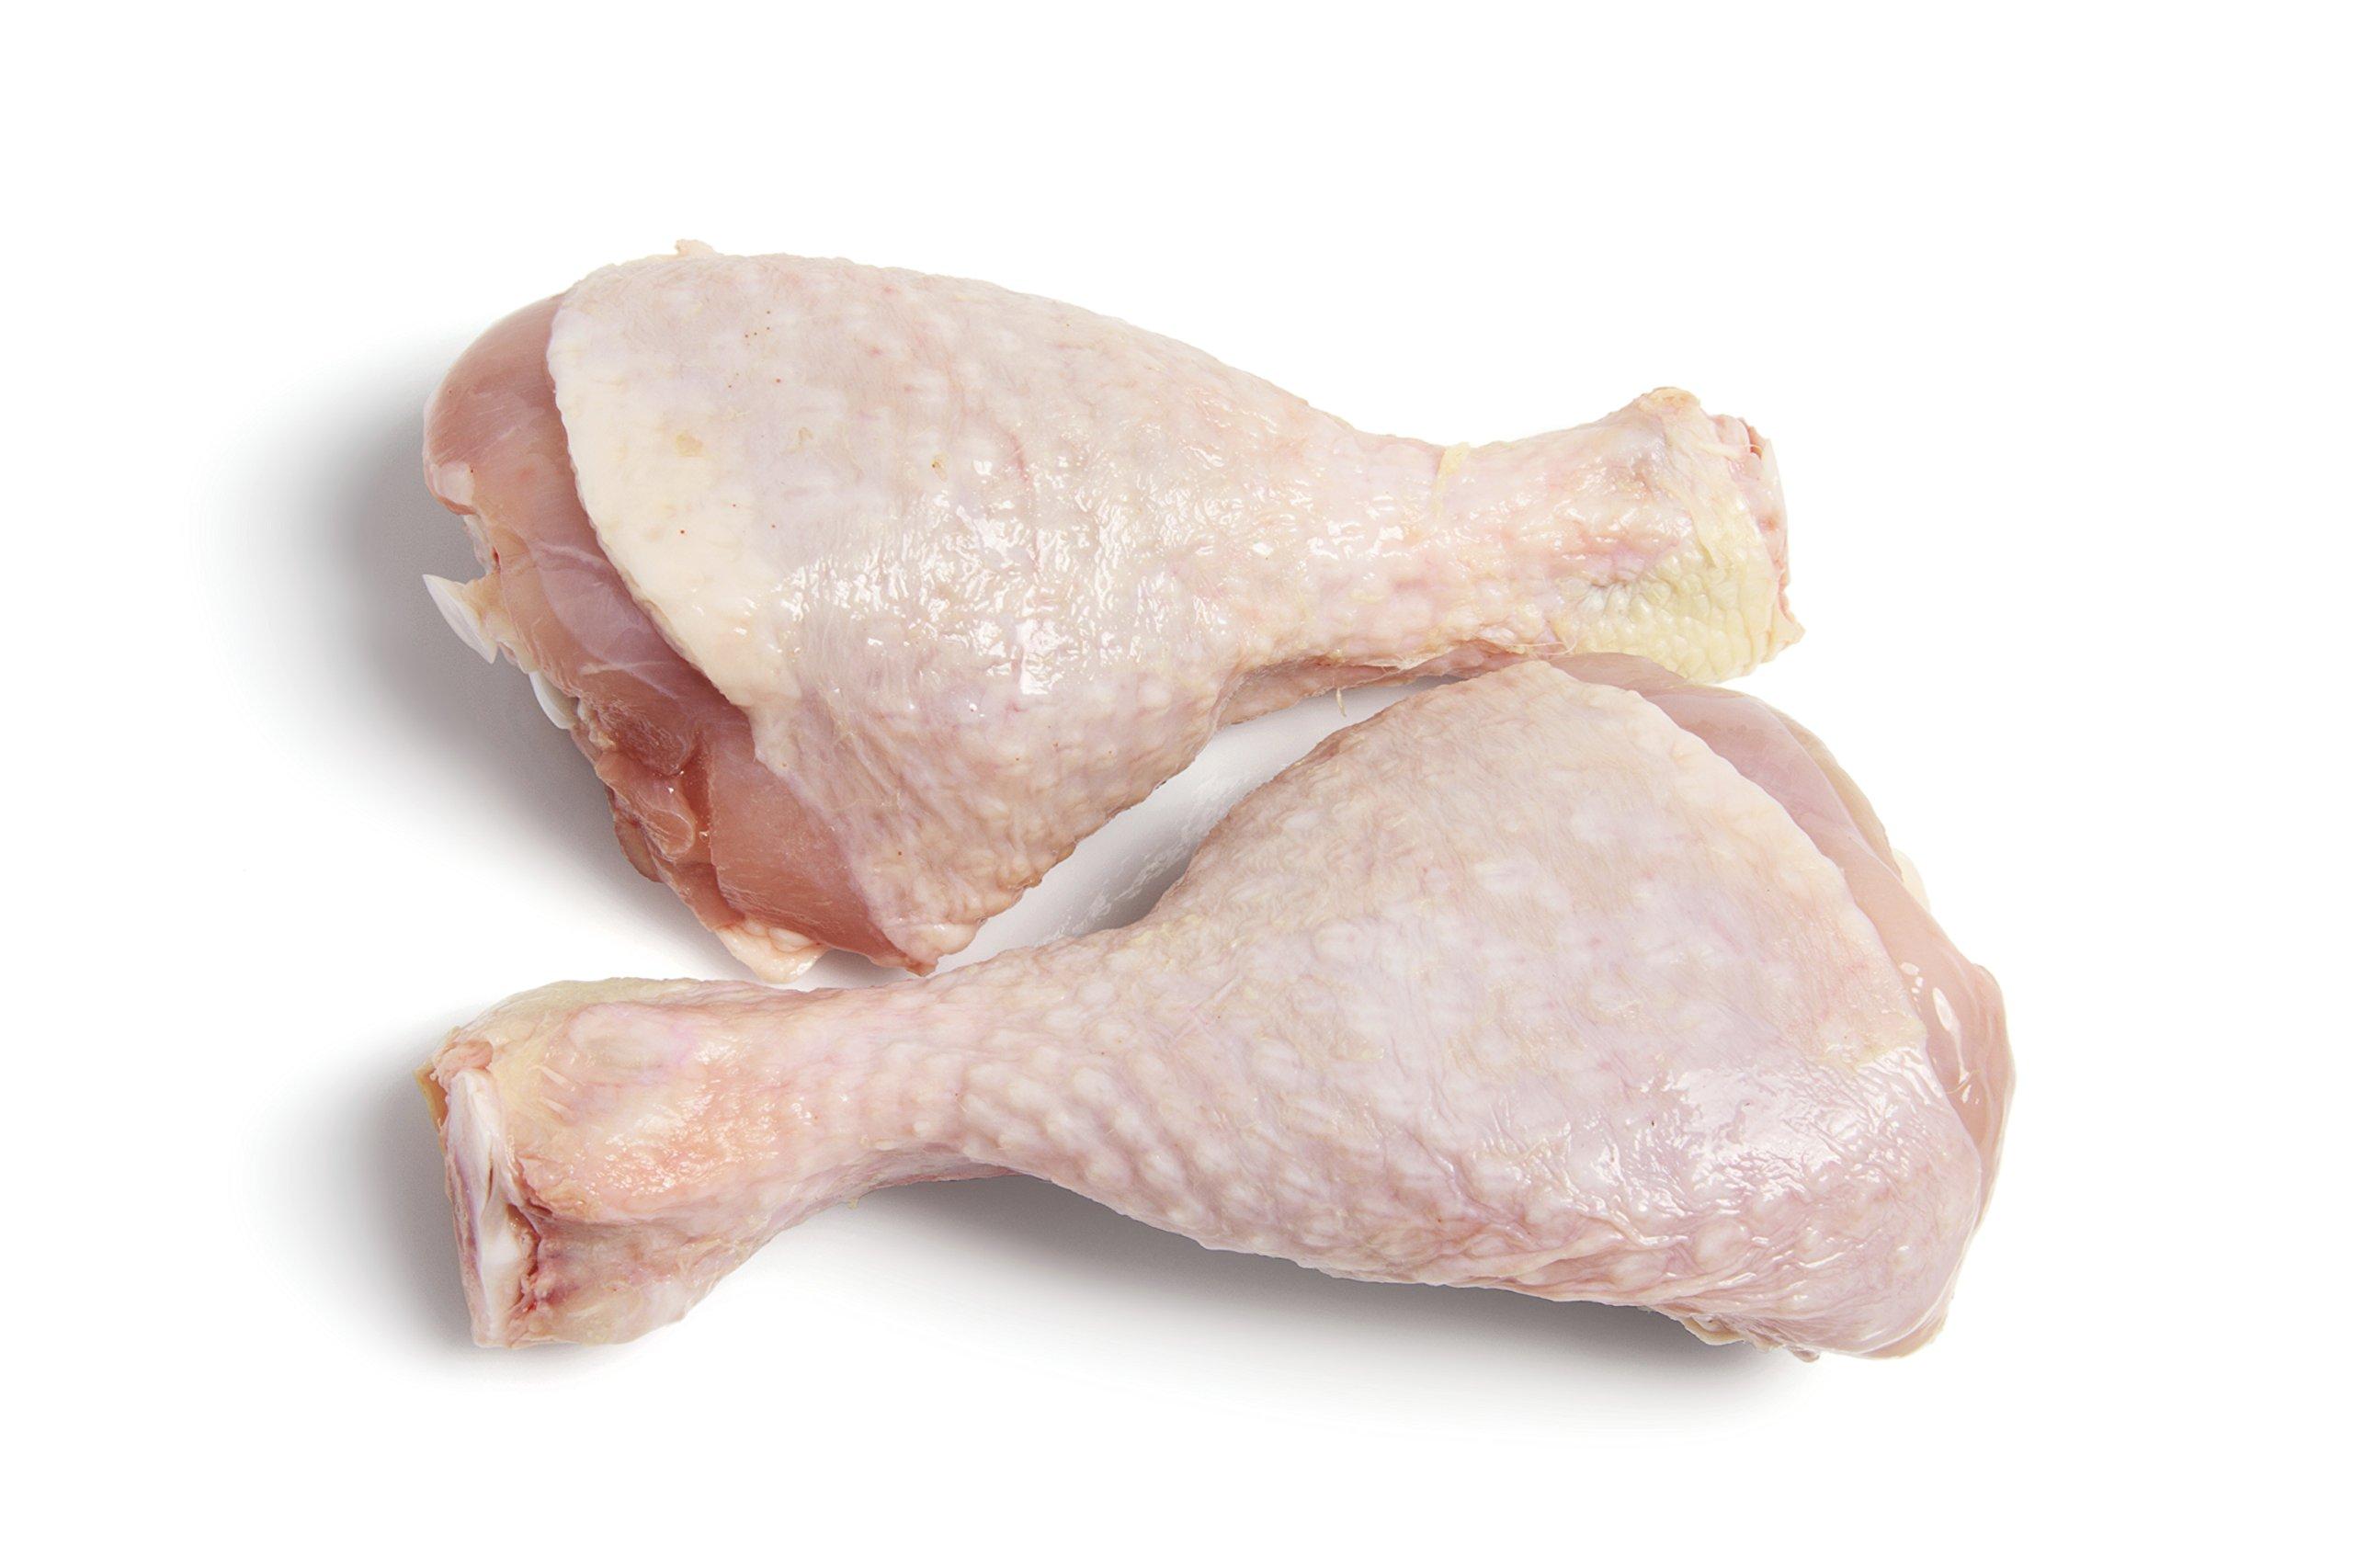 Double Certified Organic Chicken Drumsticks (7.25-7.75 Lbs) - Glatt Kosher